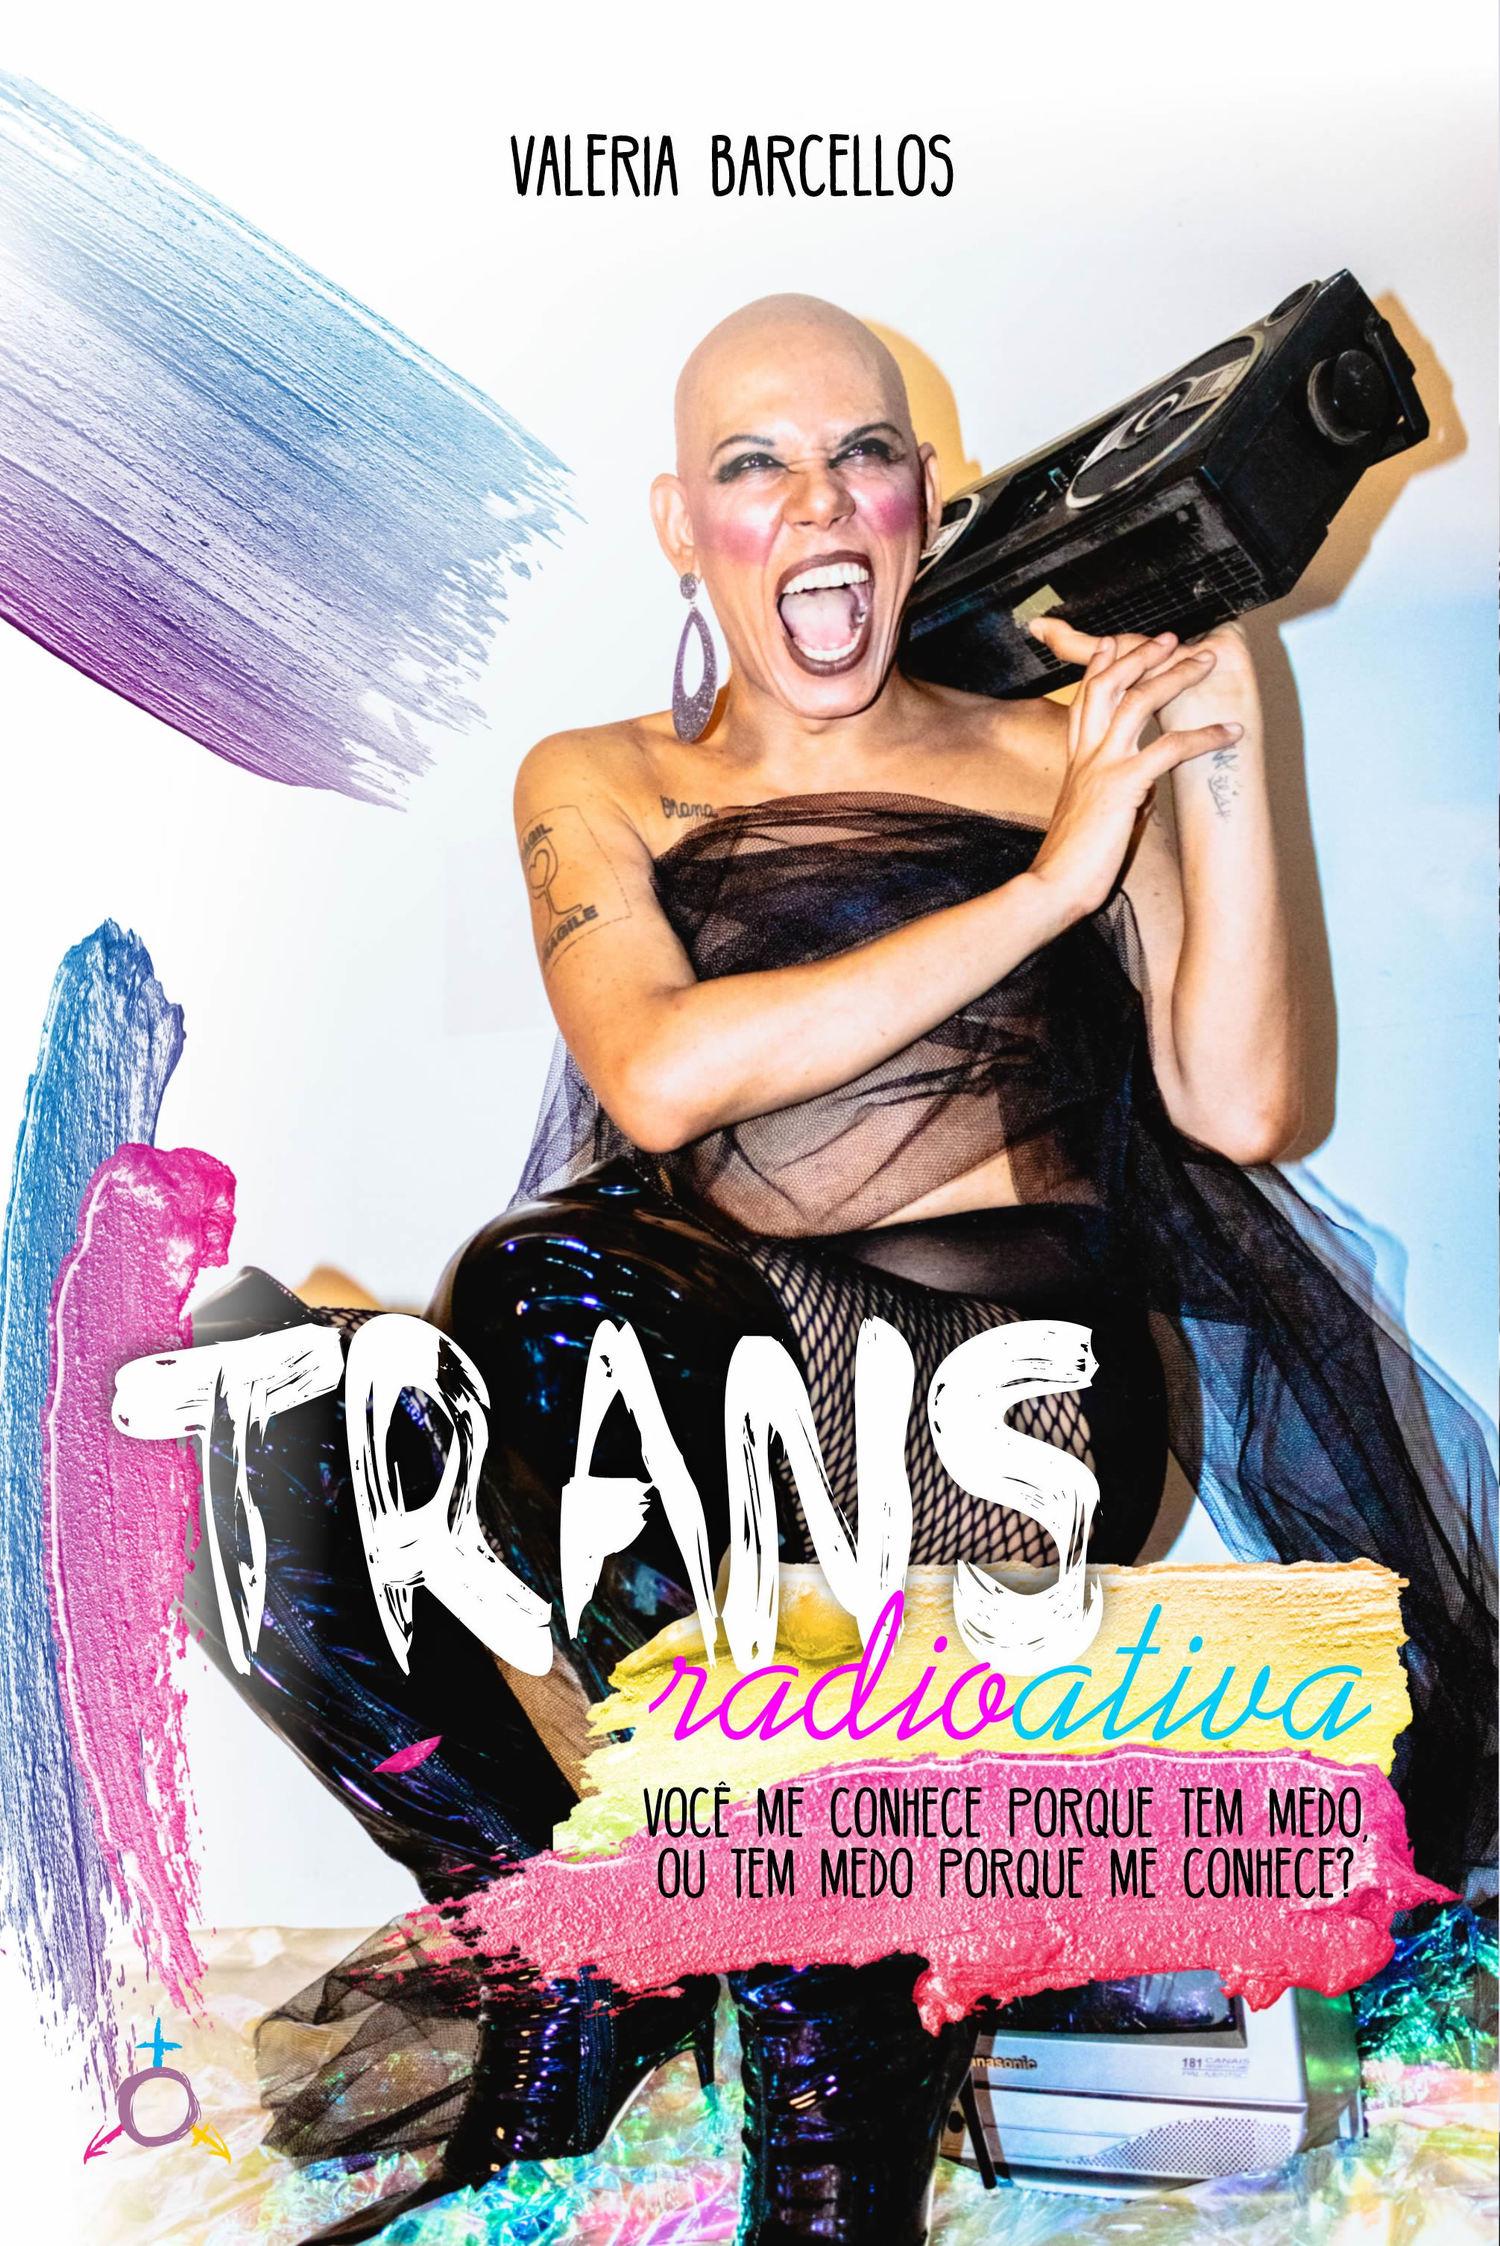 Livro Transradioativa